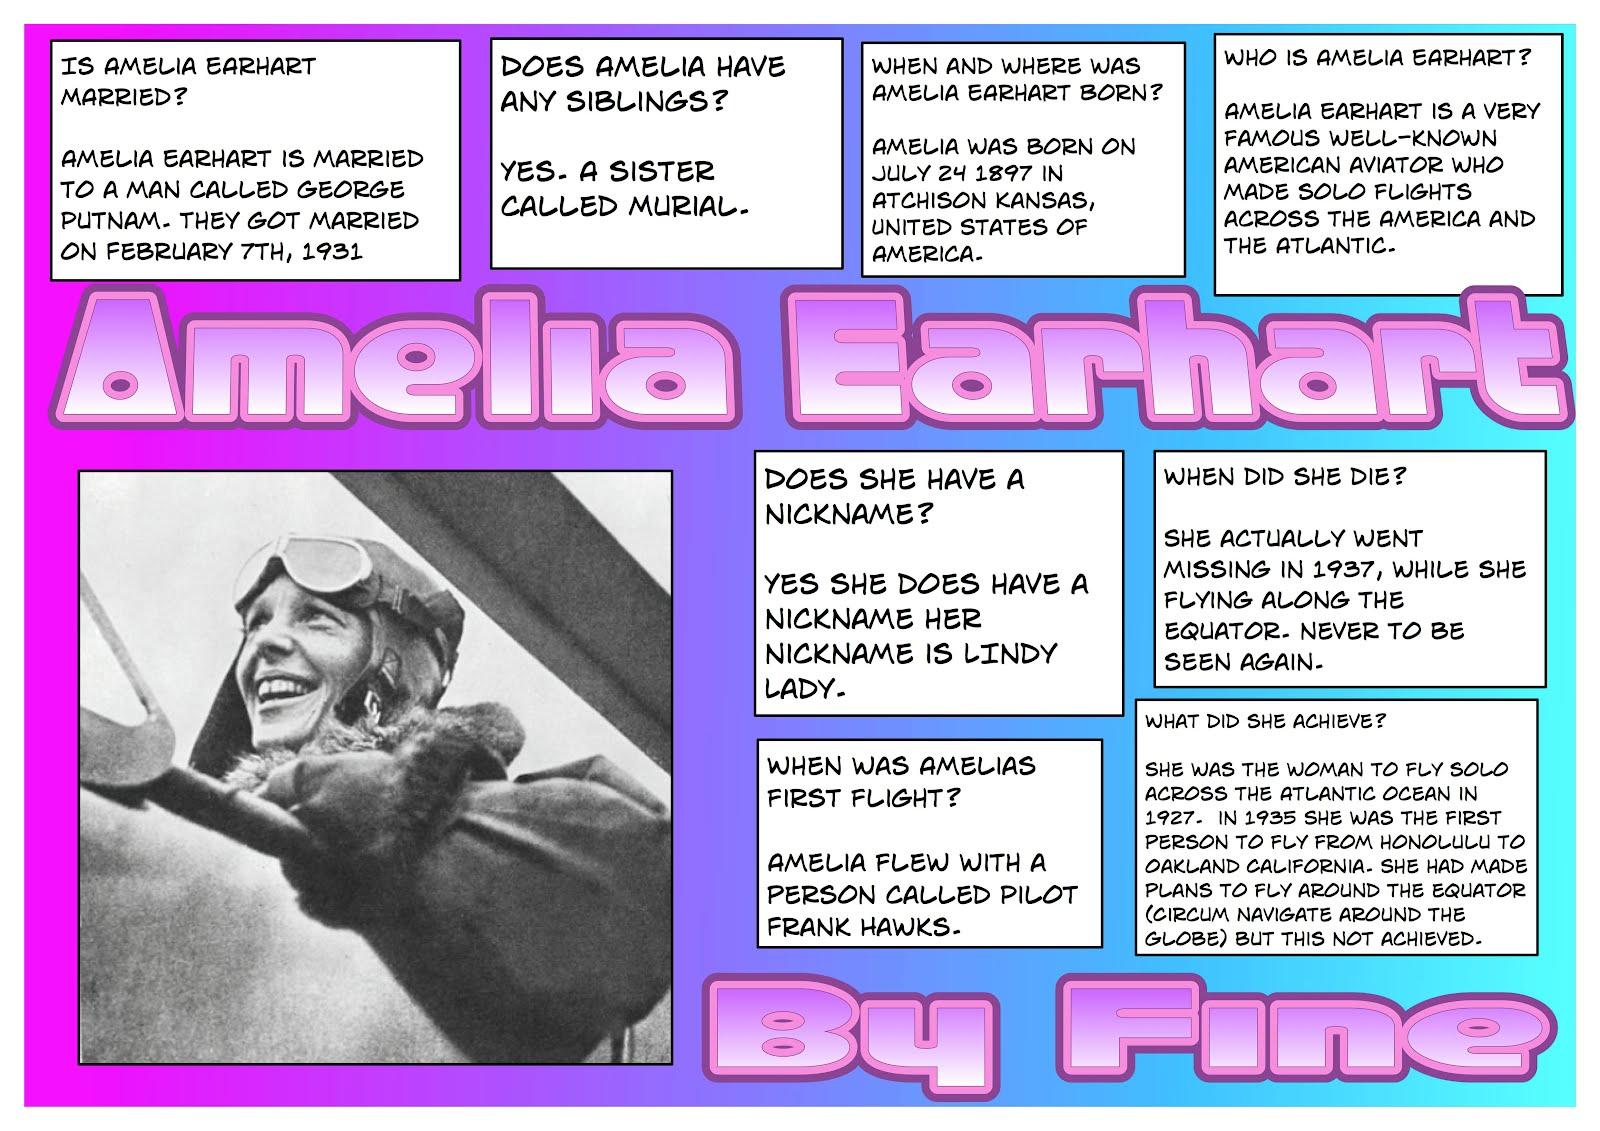 Creative Voice My Amelia Earhart Poster